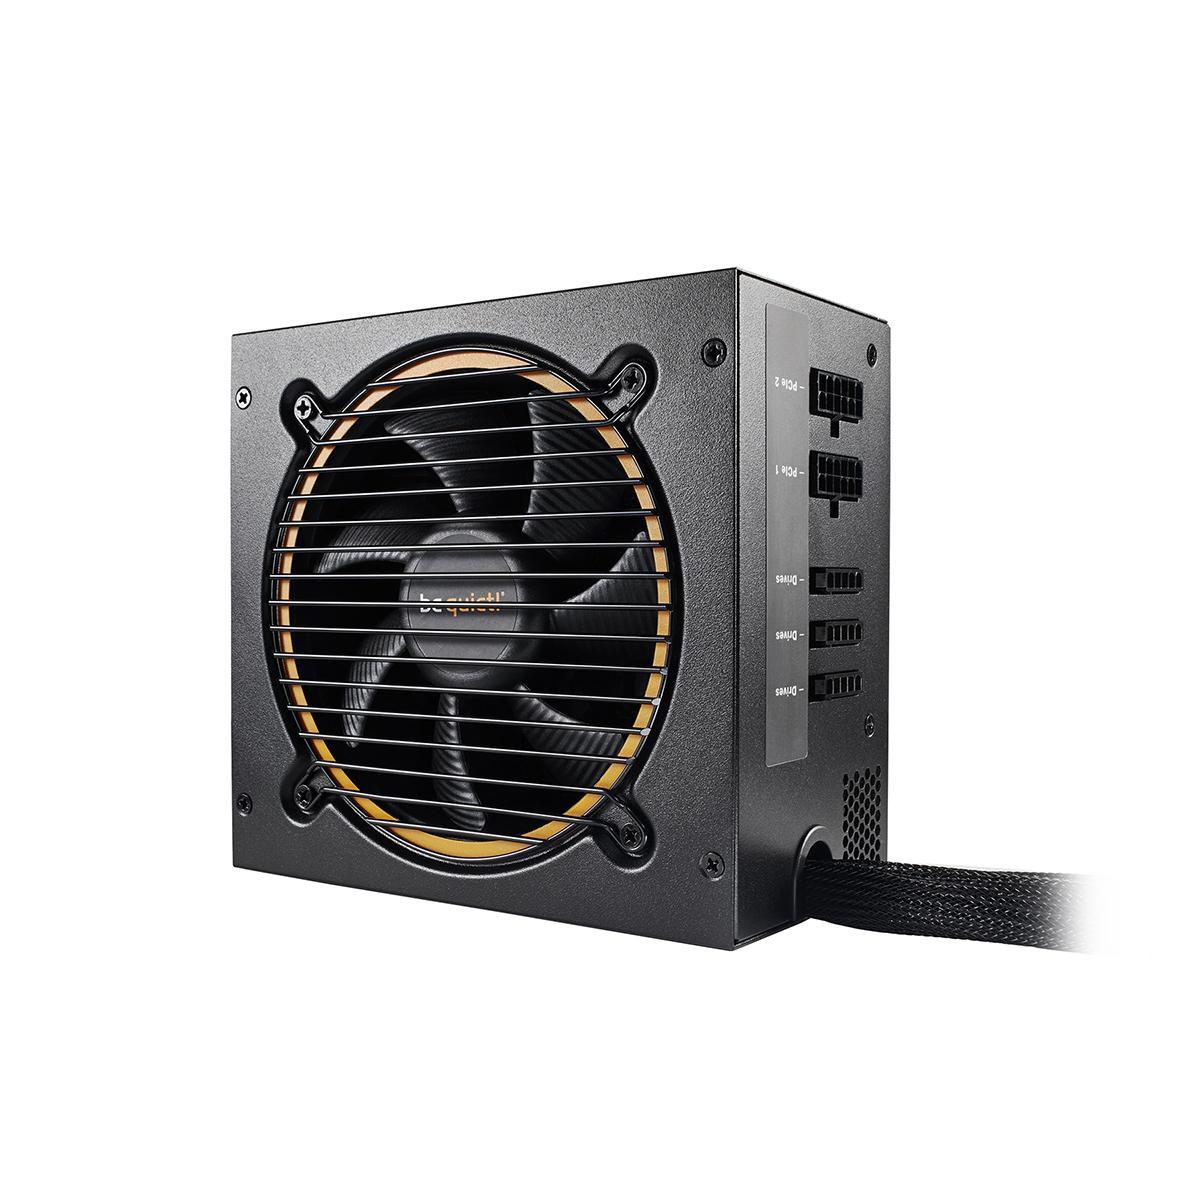 be quiet! Pure Power 11 CM 600 W 80+ Gold Certified Semi-modular ATX Power Supply